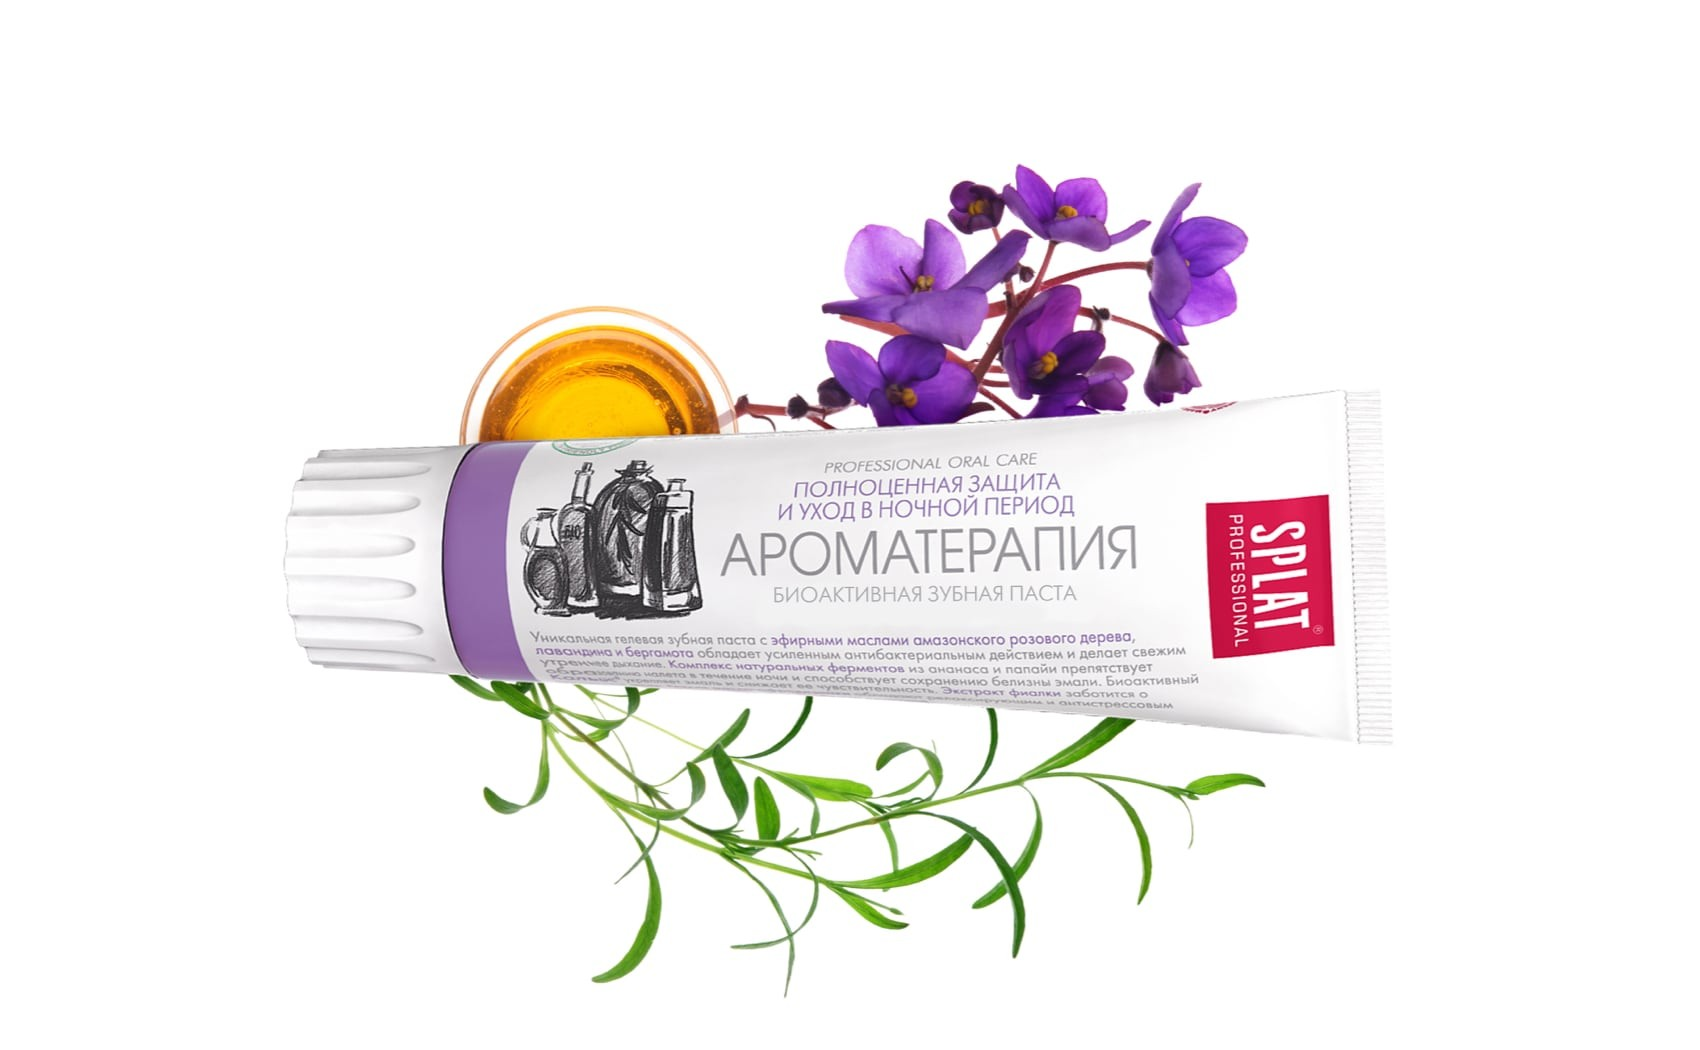 Kem Đánh Răng Splat Aromatherapy Professional Series 100ml - 6474375676261